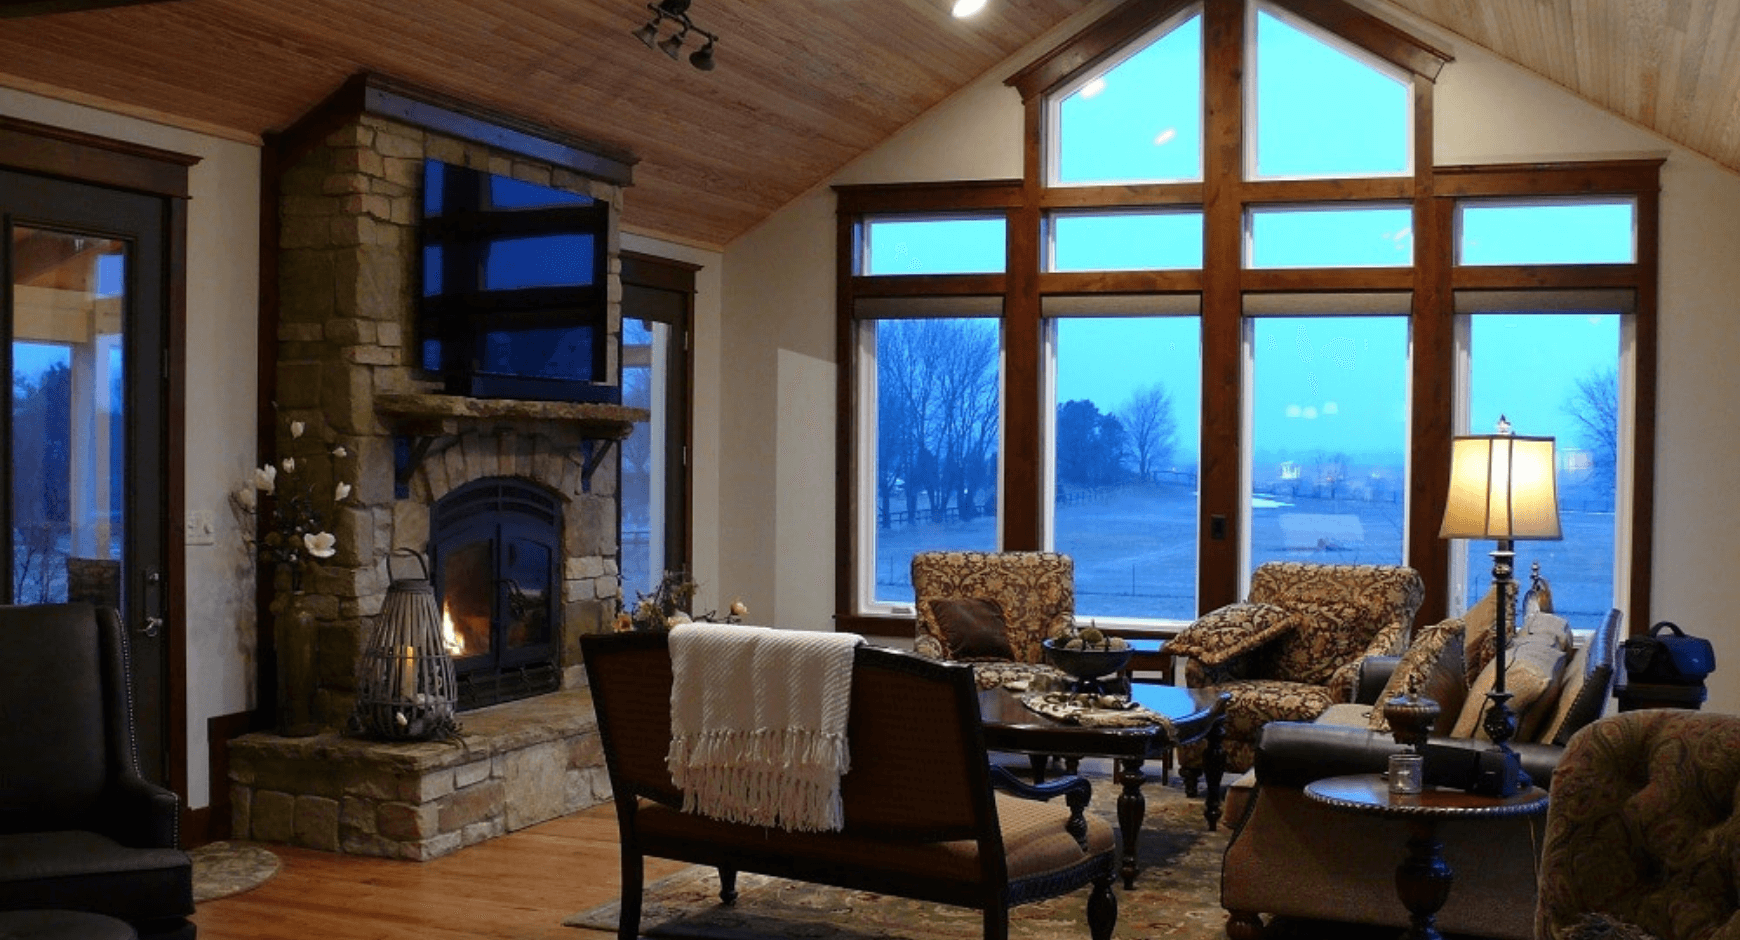 Cozy mortared stone veneer fireplace